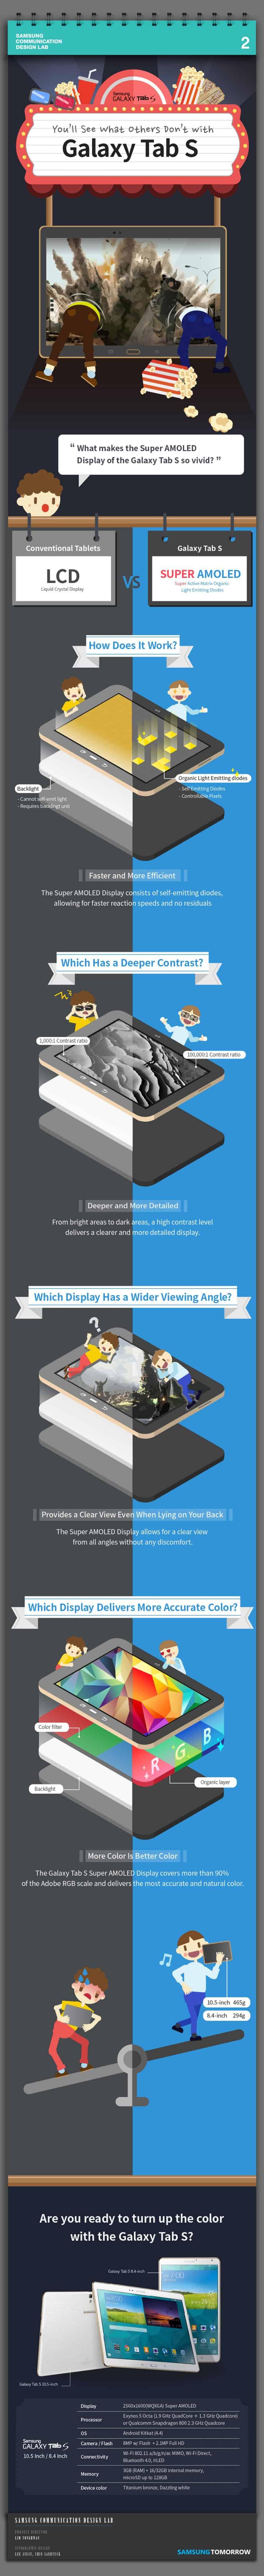 Galaxy-Tab-S Info graphic 2